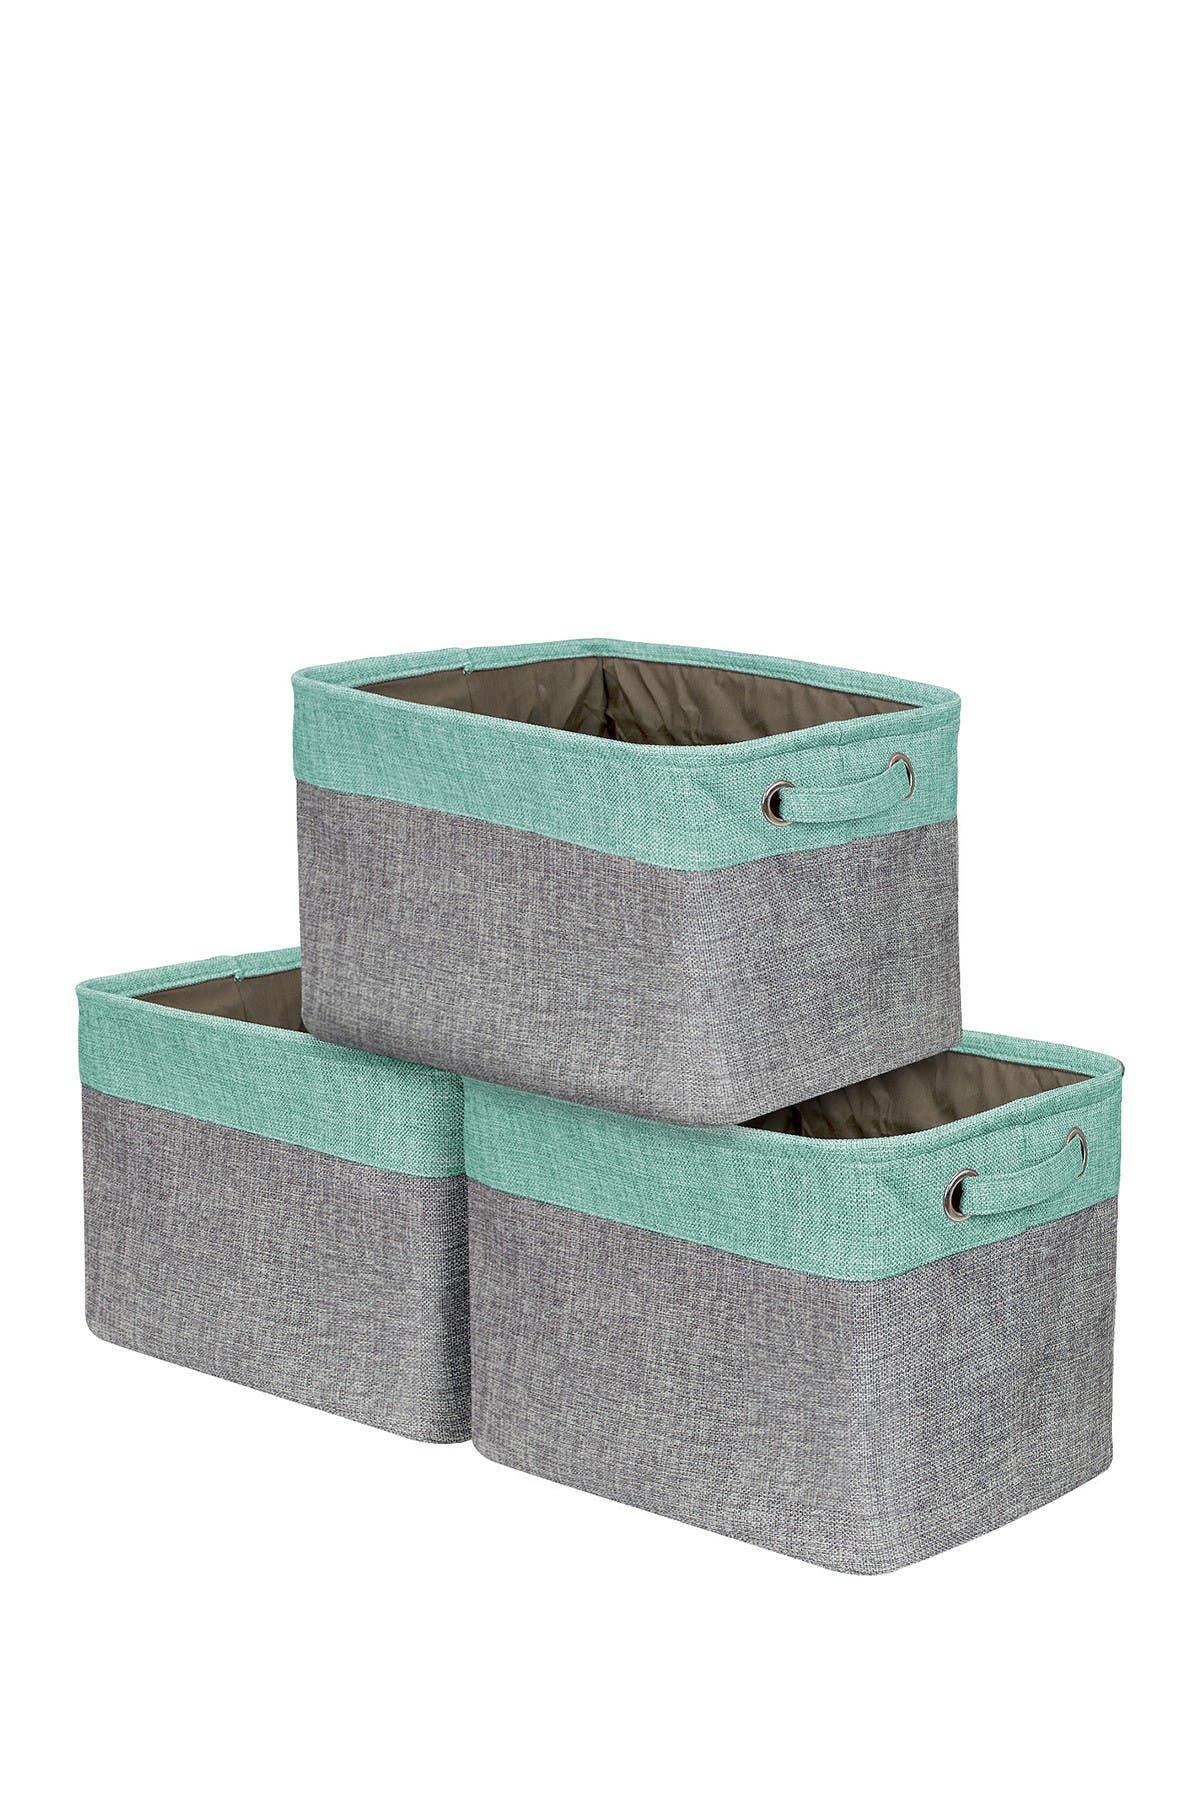 Image of Sorbus Teal Twill Storage Basket - Set of 3